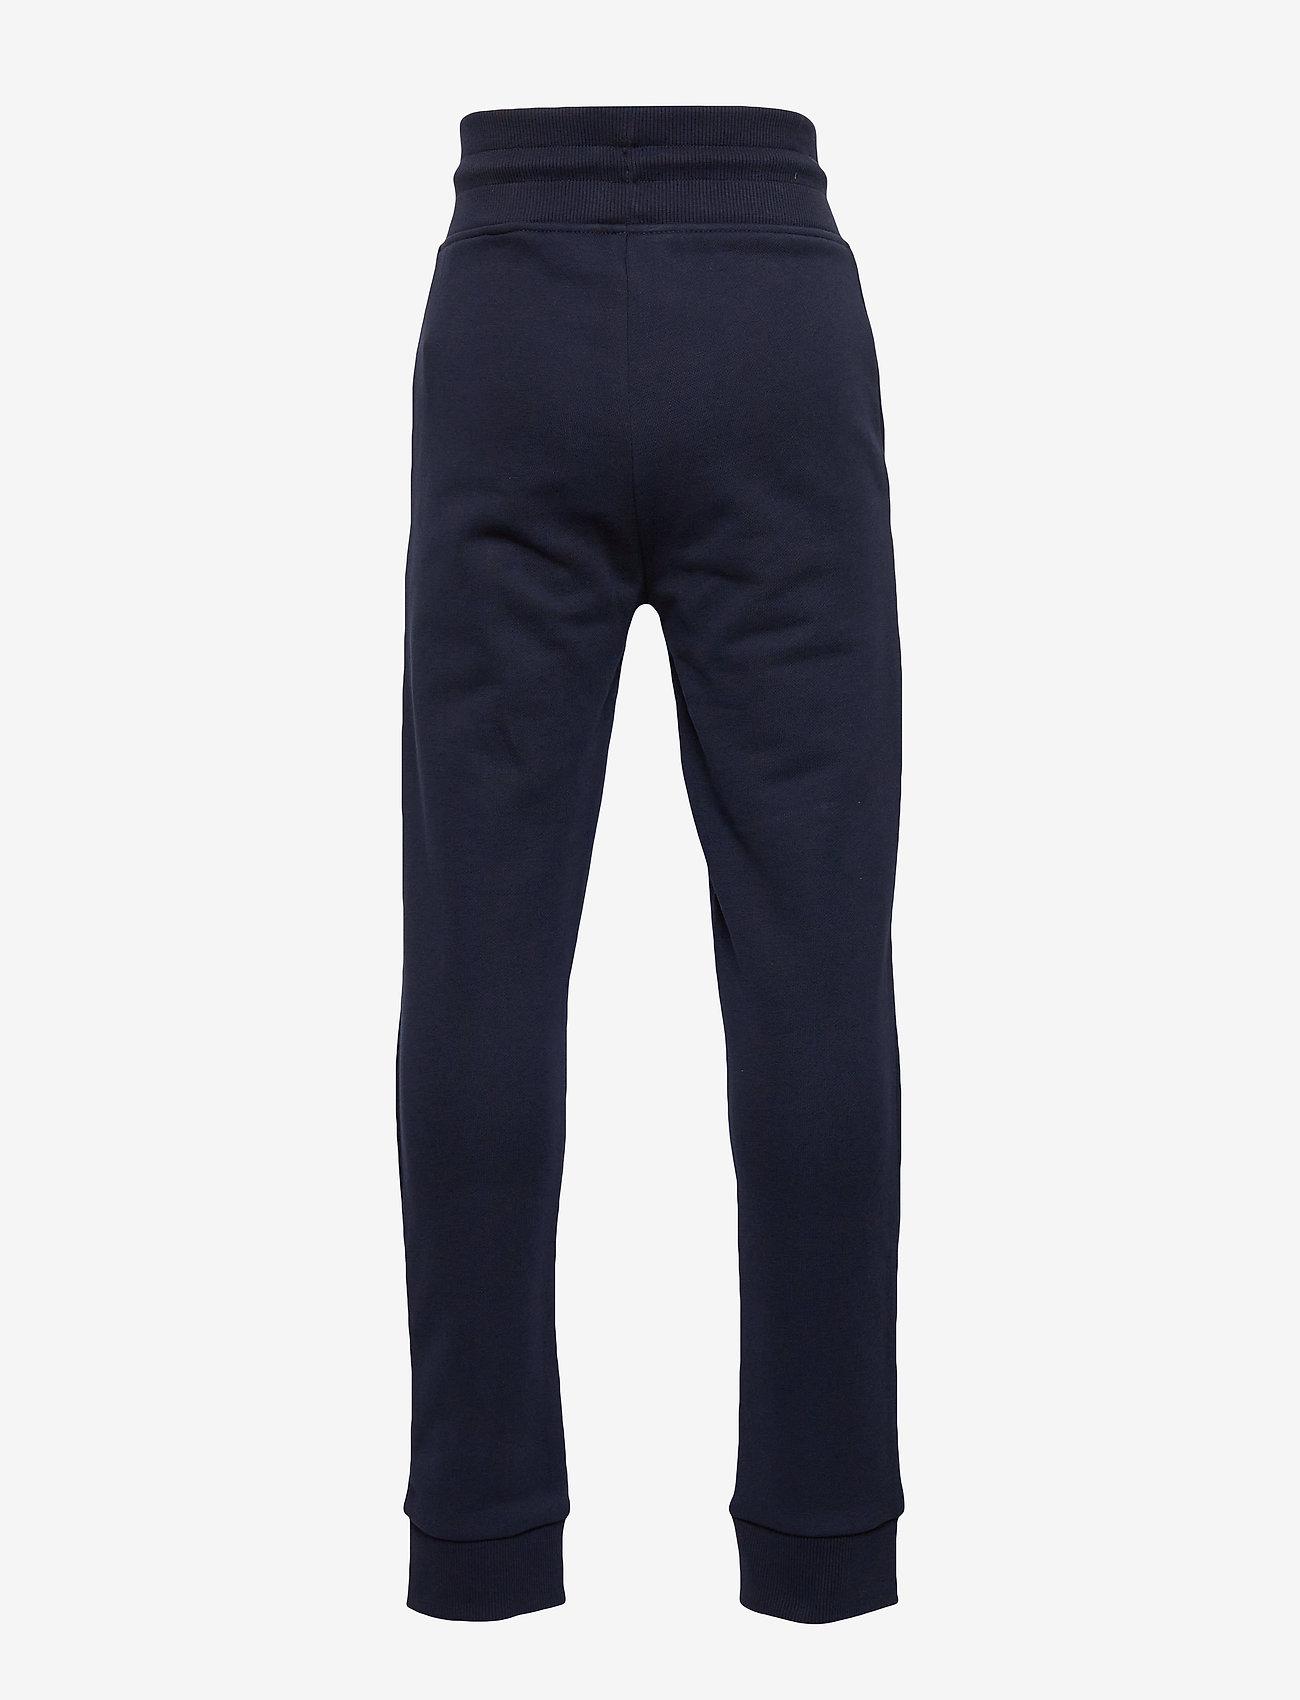 GANT - THE ORIGINAL SWEAT PANTS - sweatpants - evening blue - 1